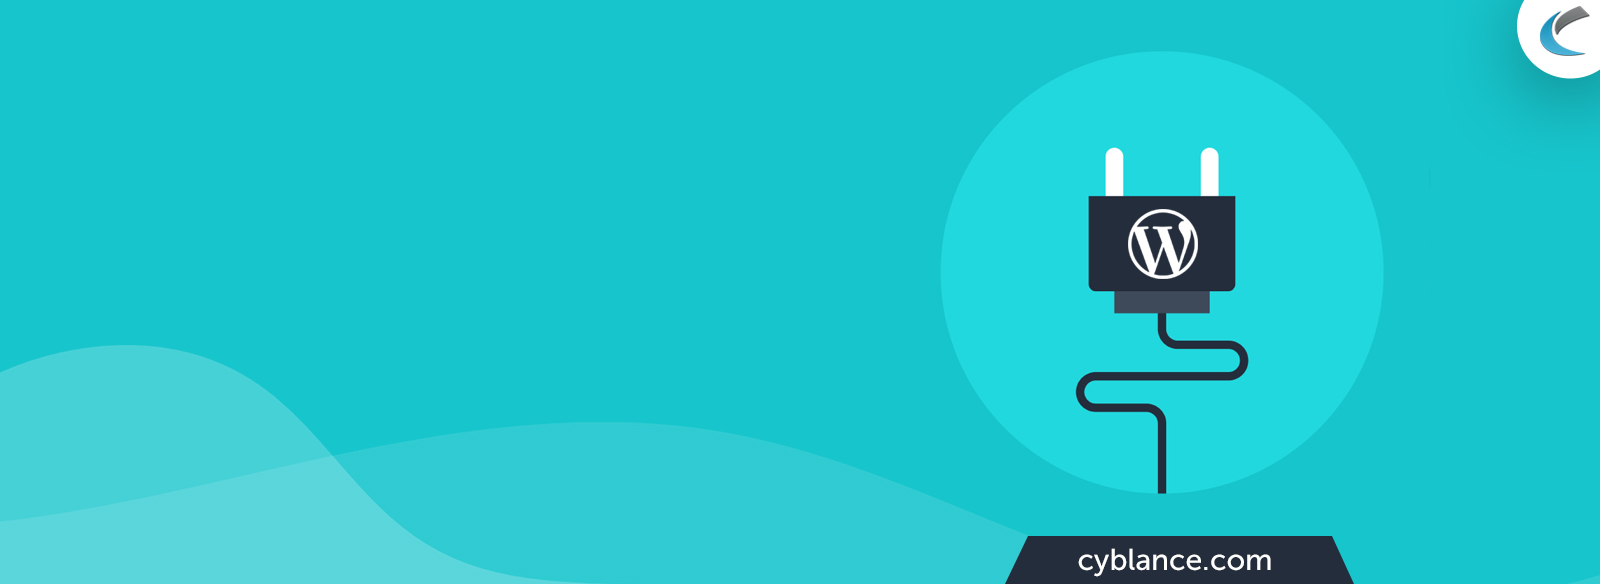 Hire Wordpress Developer Banner